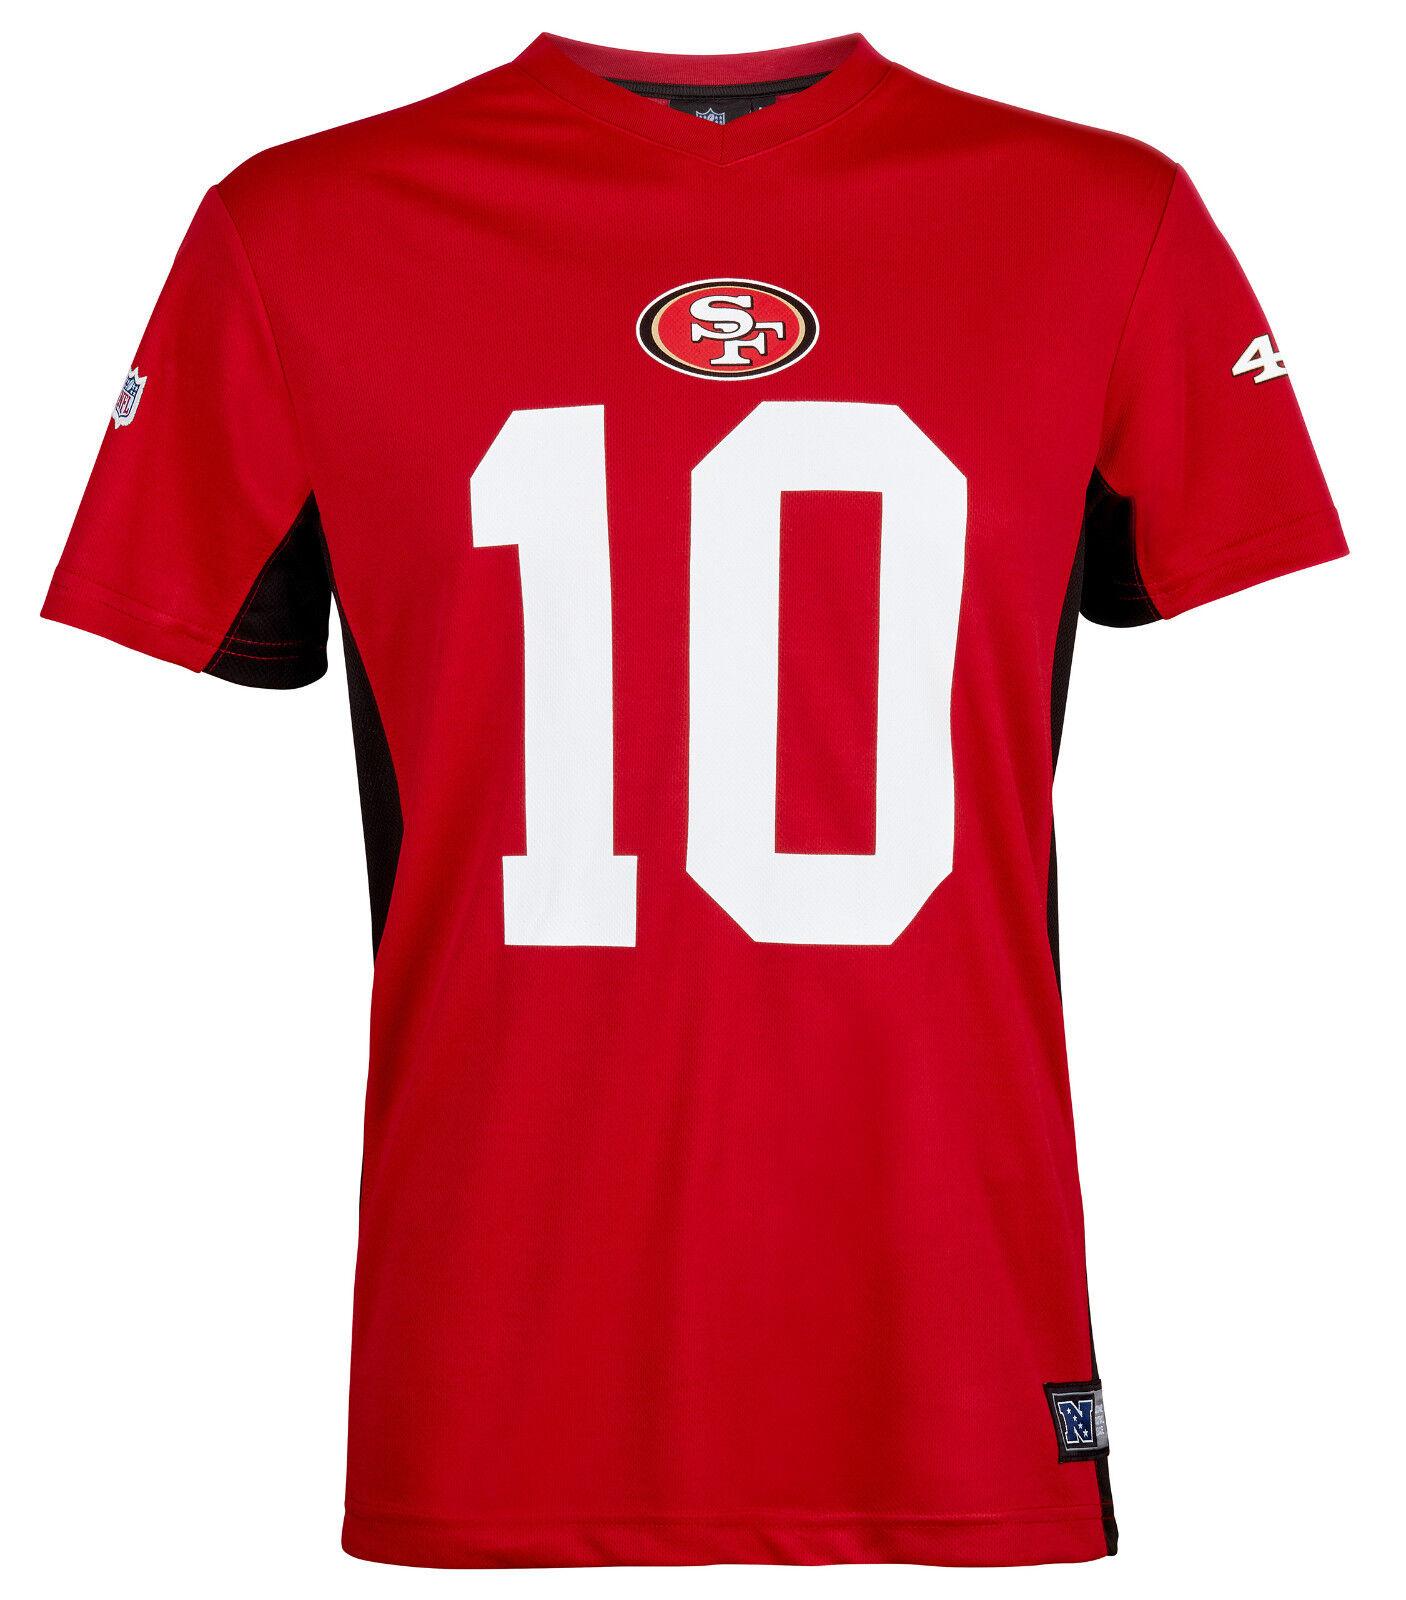 NFL San Francisco 49ers Jimmy Garoppolo 10 Trikot Jersey Shirt Polymesh 2018